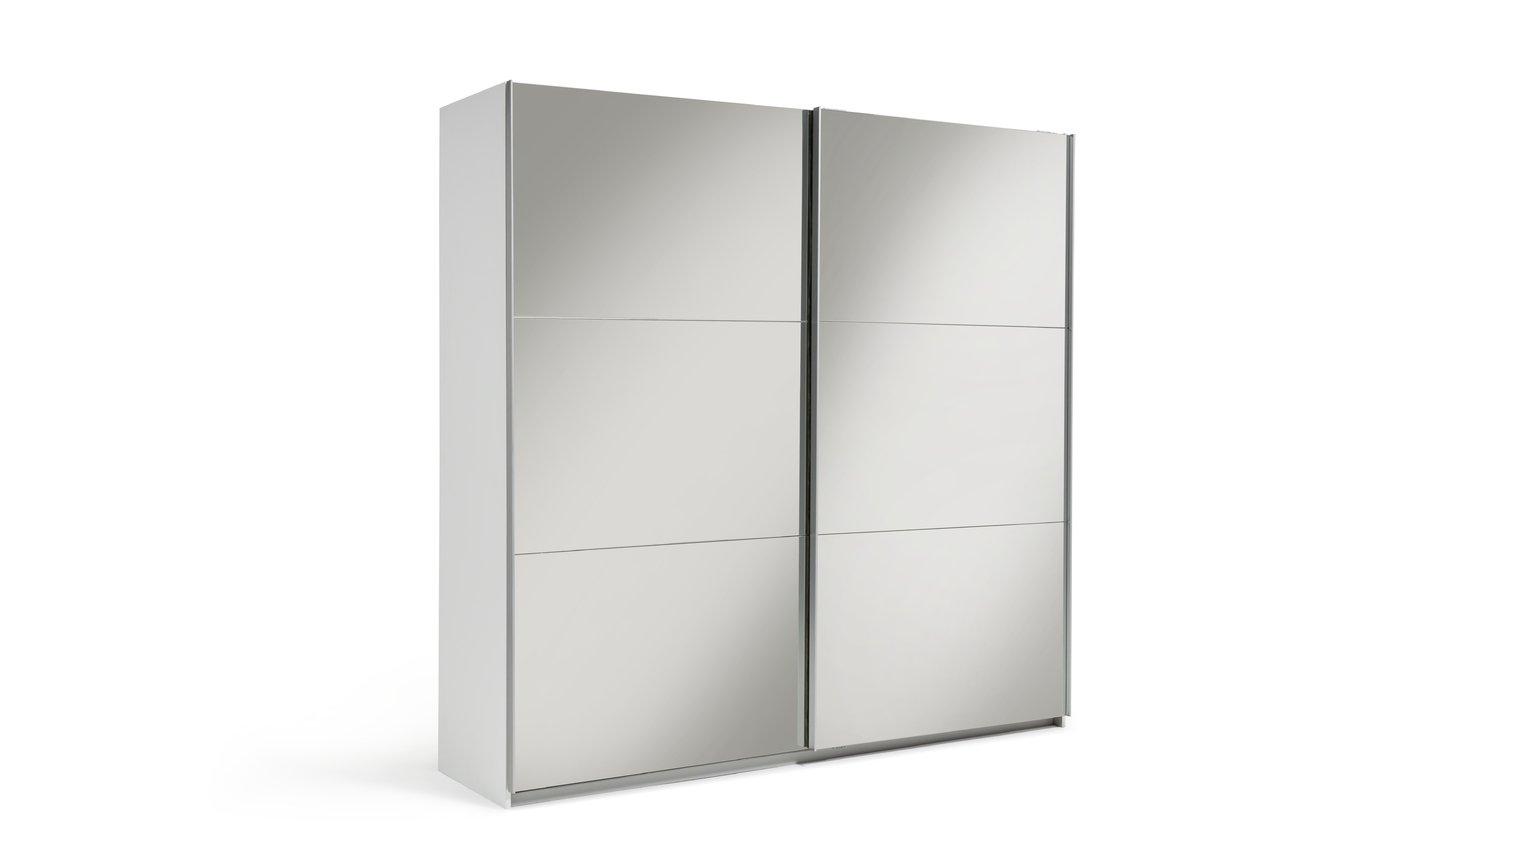 Argos Home Holsted Mirrored XL Sliding Wardrobe - White